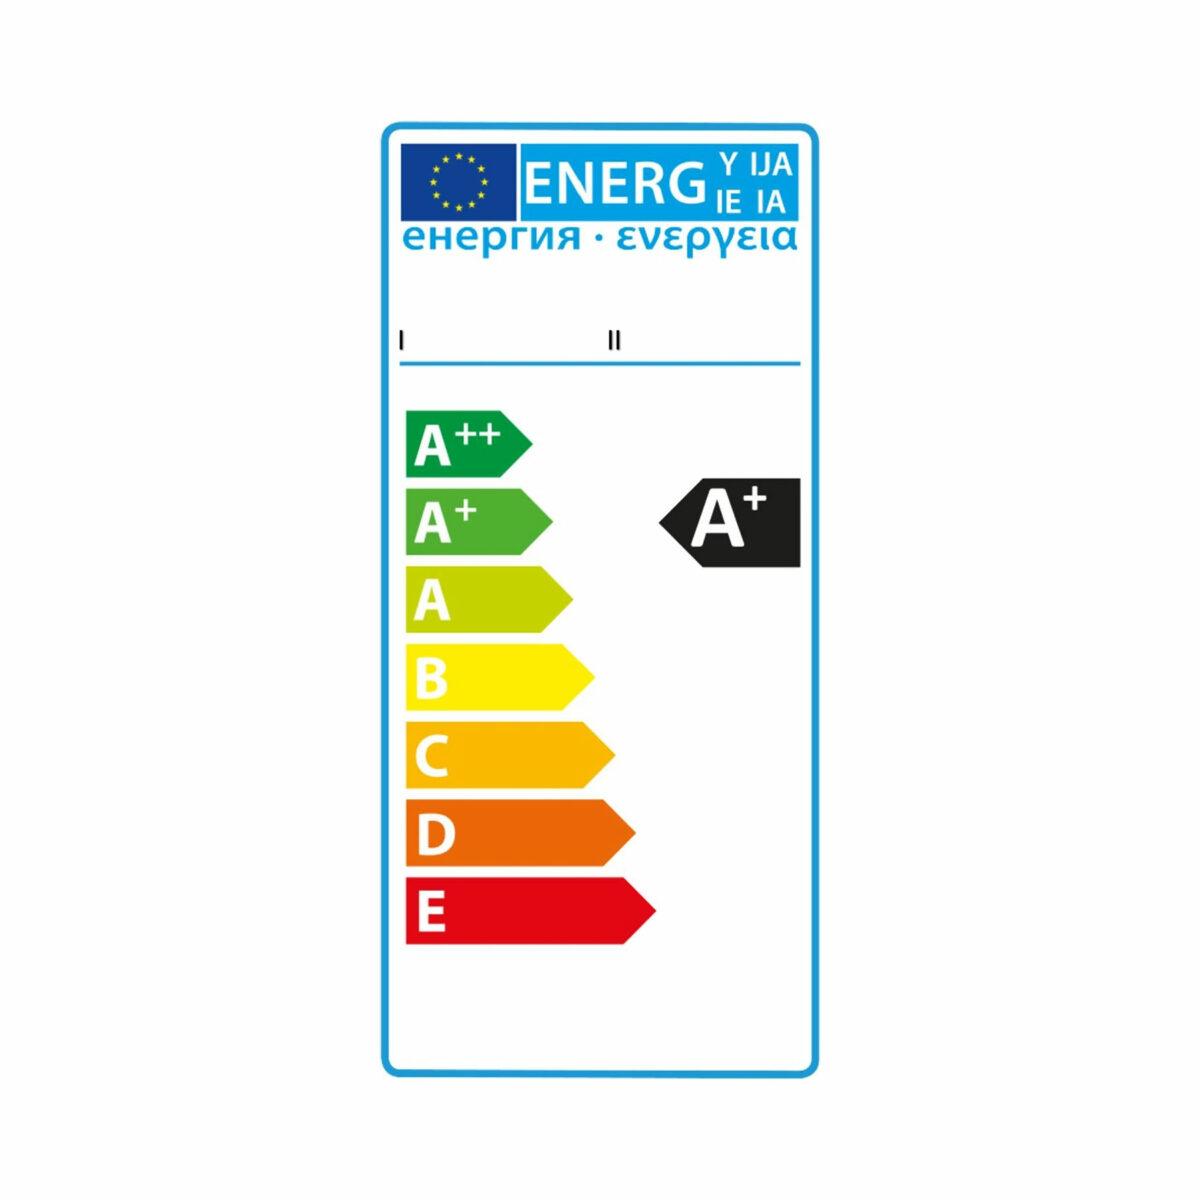 5watt MR16 LED 12volt GU5.3 Cap Warm White Equivalent To 35watt 36 Degree Dimmable